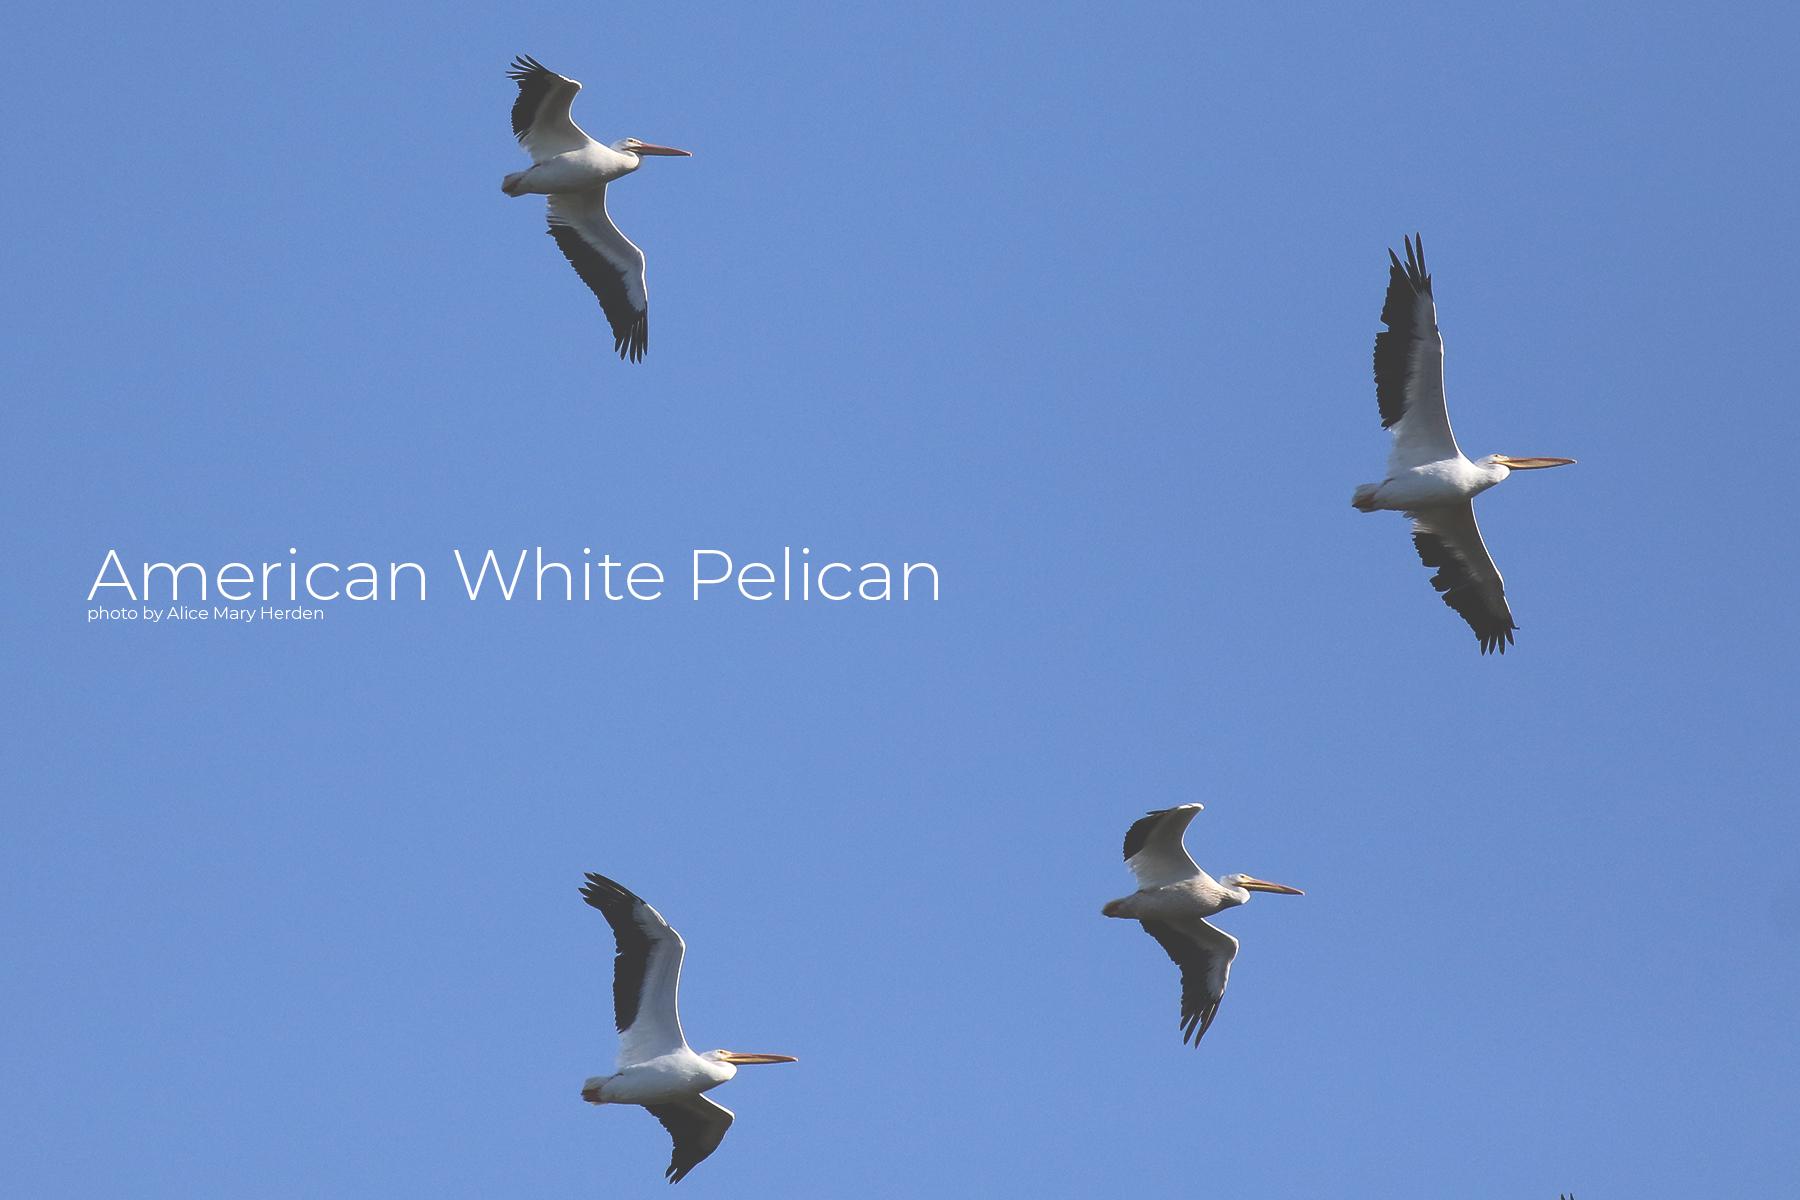 Wild Seabirds- The American White Pelican